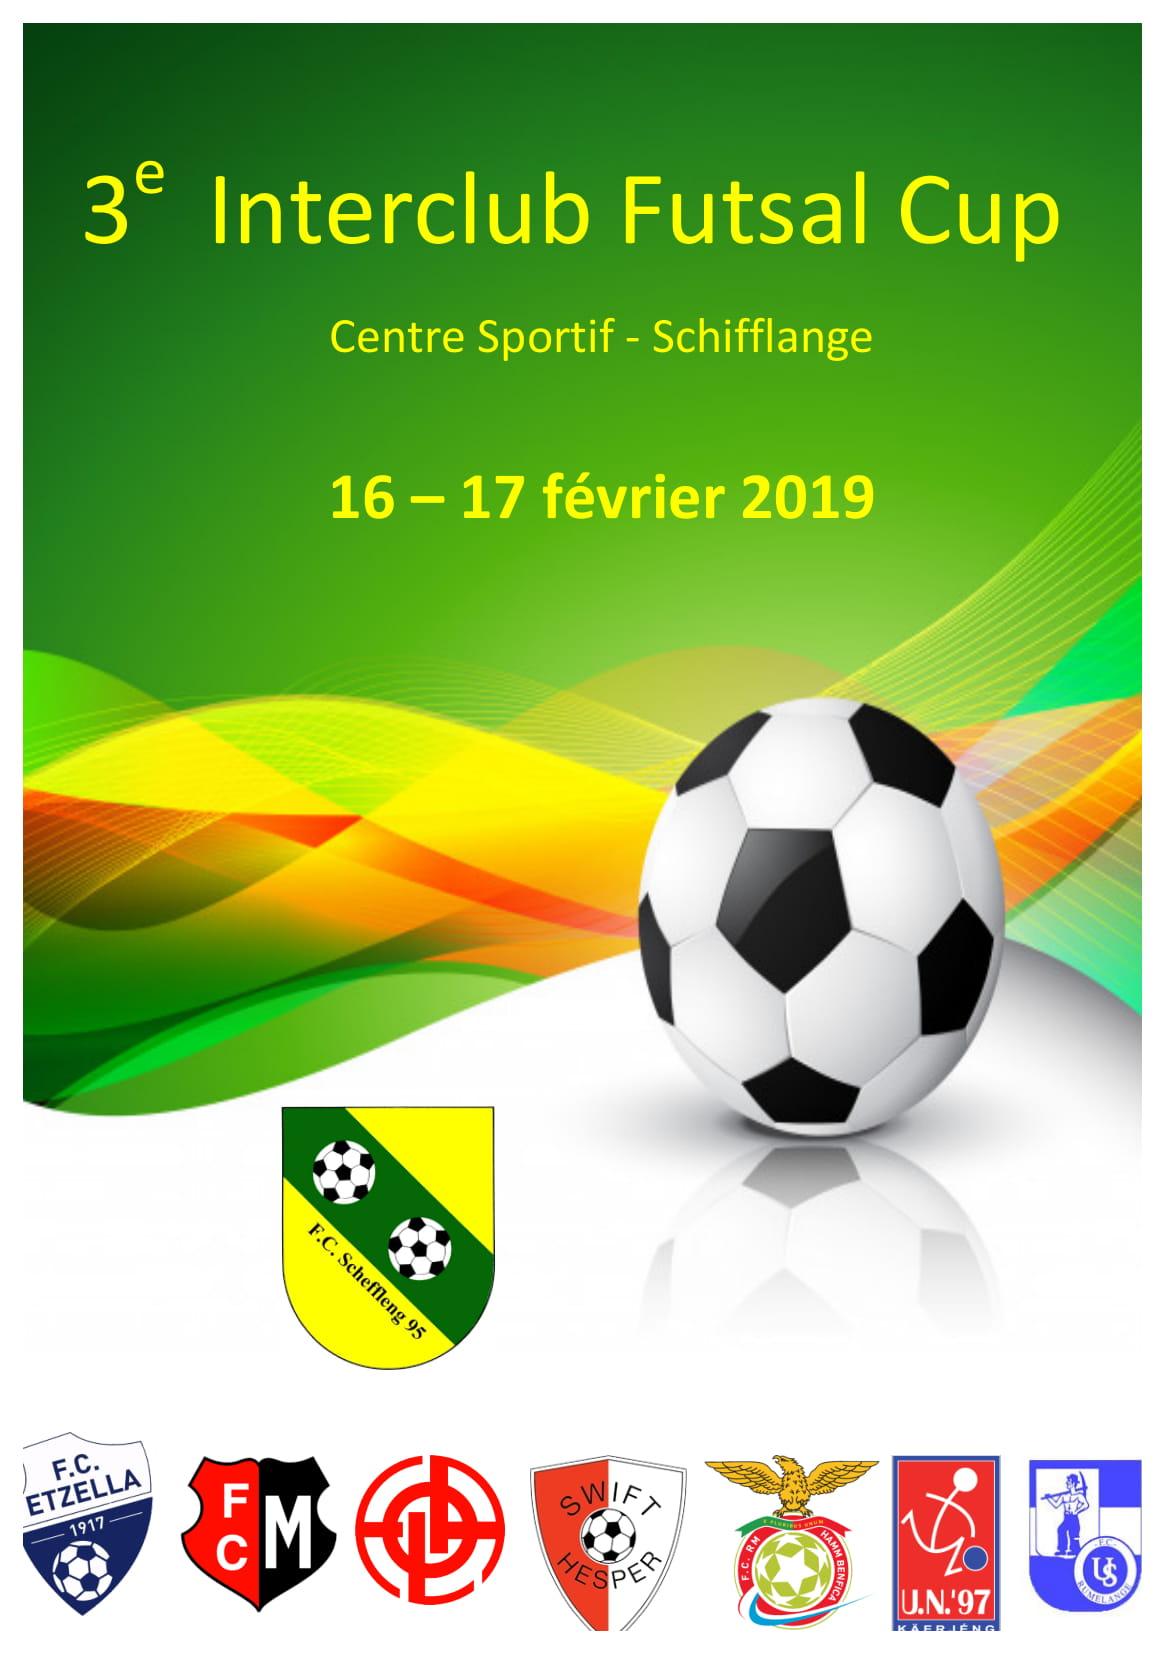 3. Interclub Futsal Cup 2019